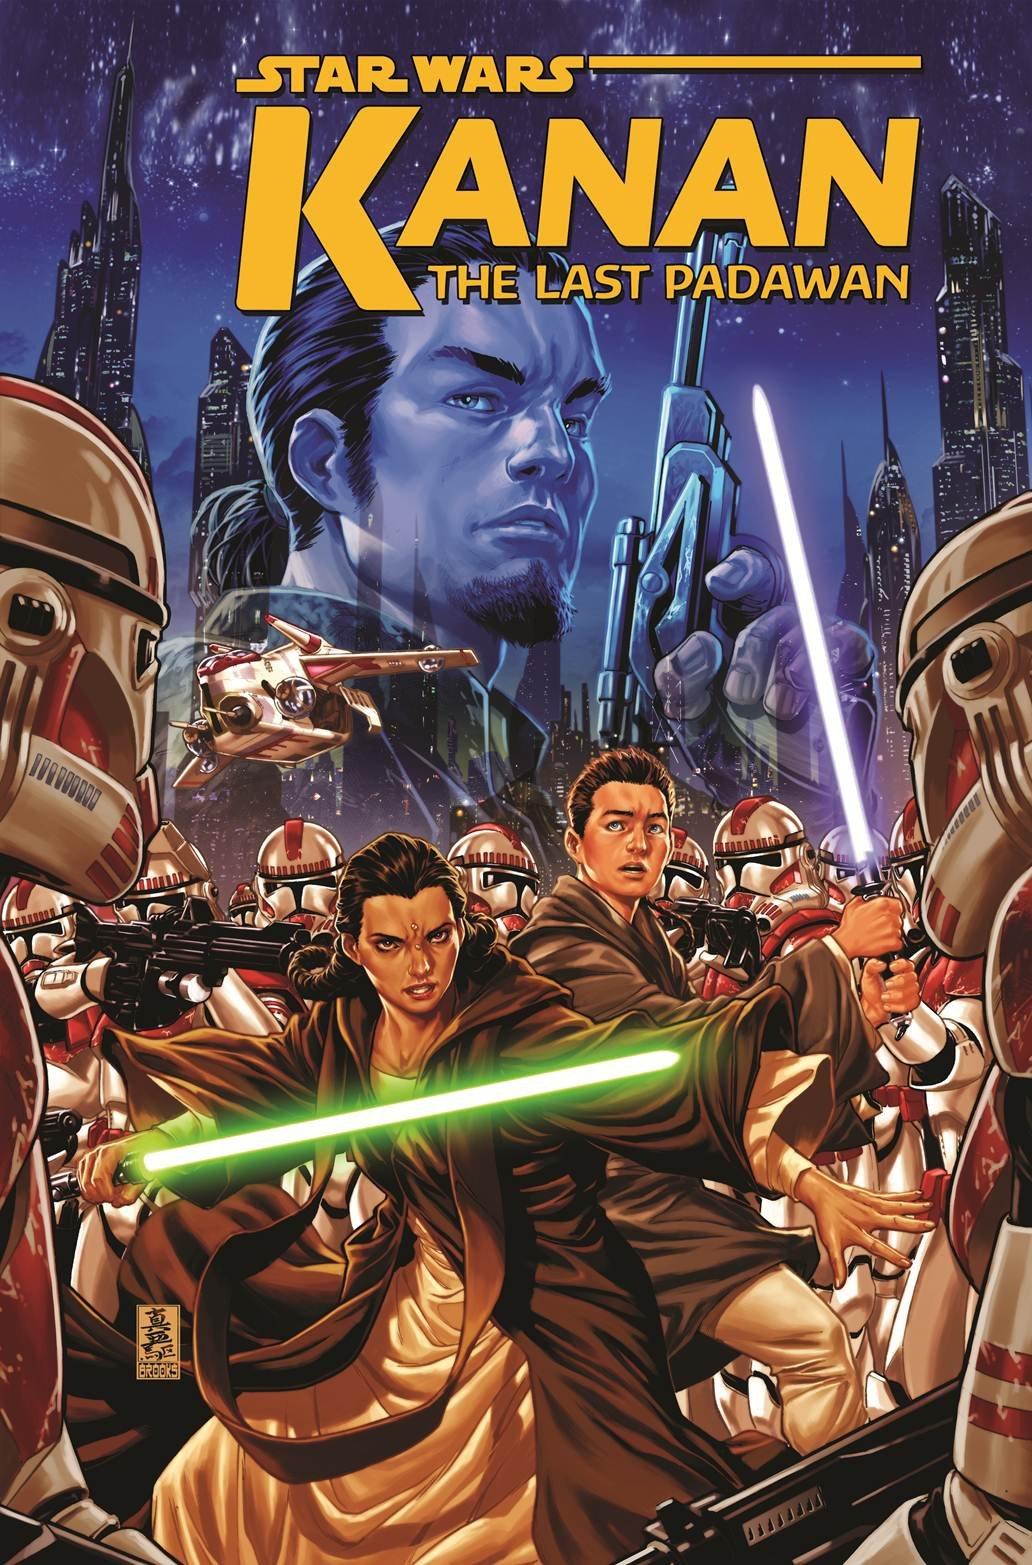 Star Wars: Kanan: The Last Padawan